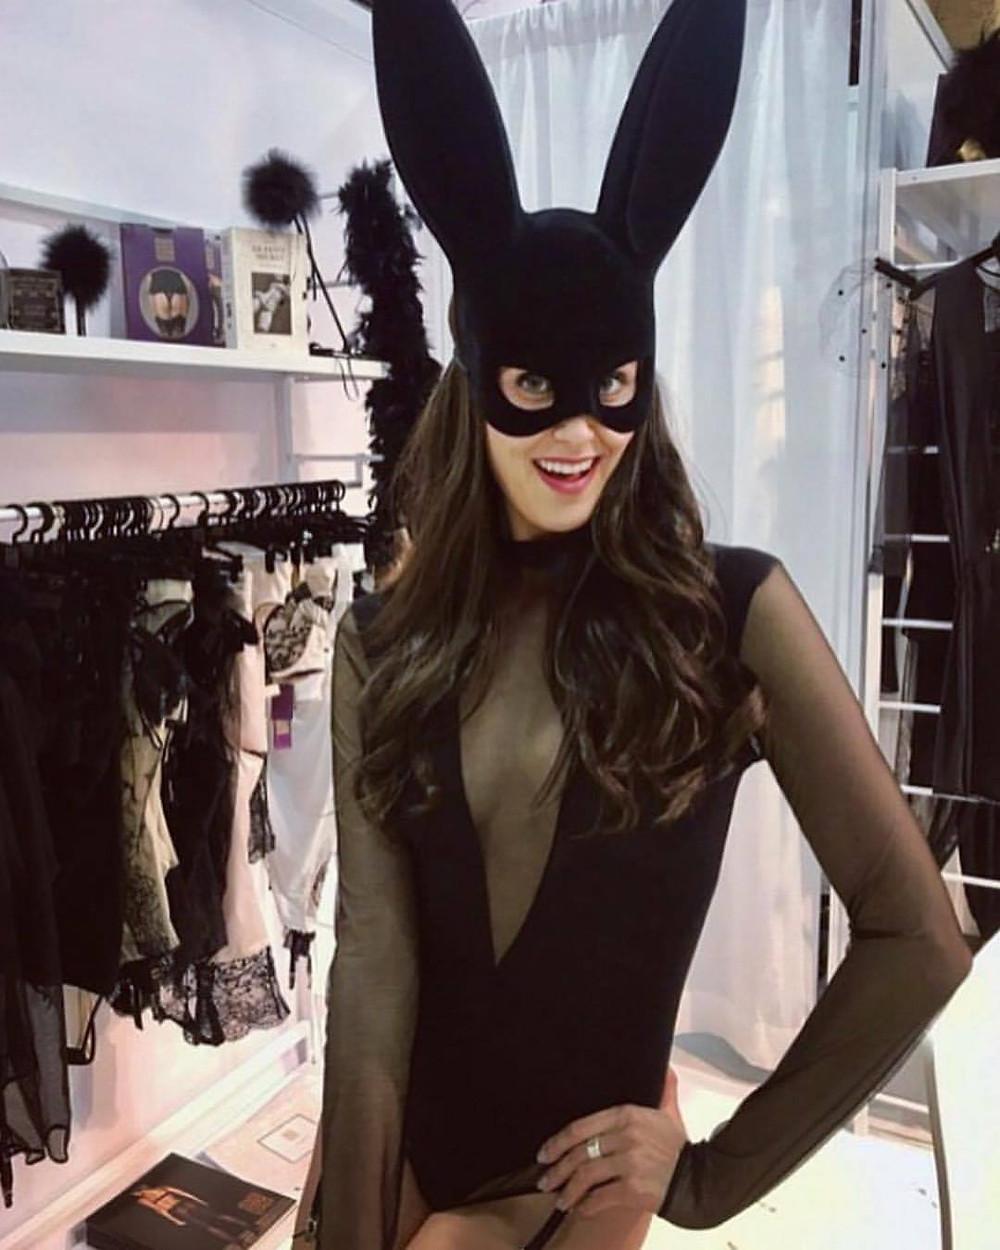 Las Vegas modeling agency, Las Vegas fashion models, Las Vegas lingerie models, Las Vegas curve models